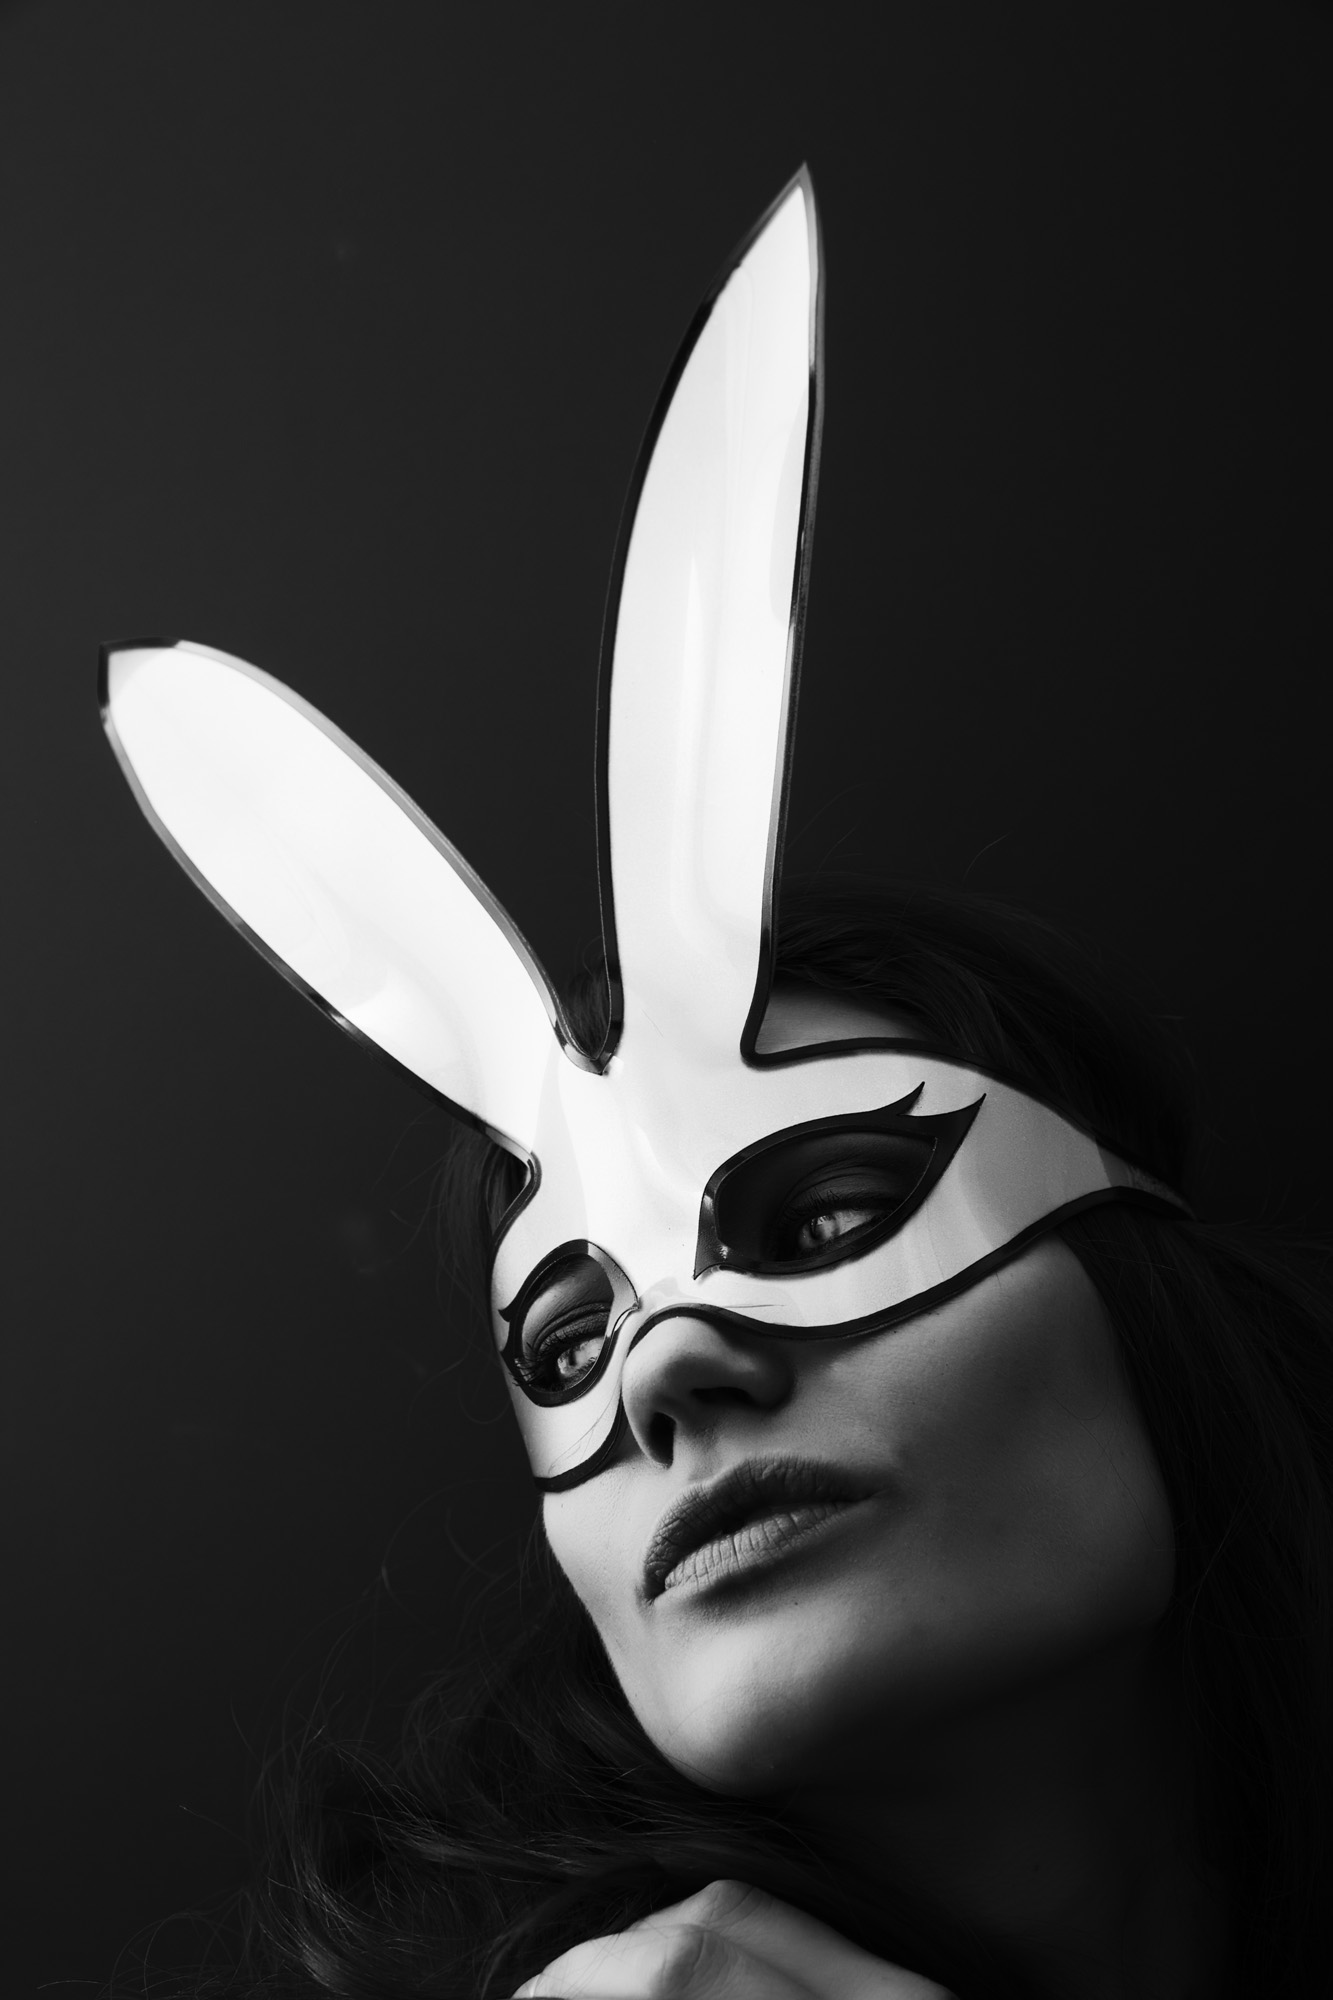 Bunny Mask - White/Black Edge